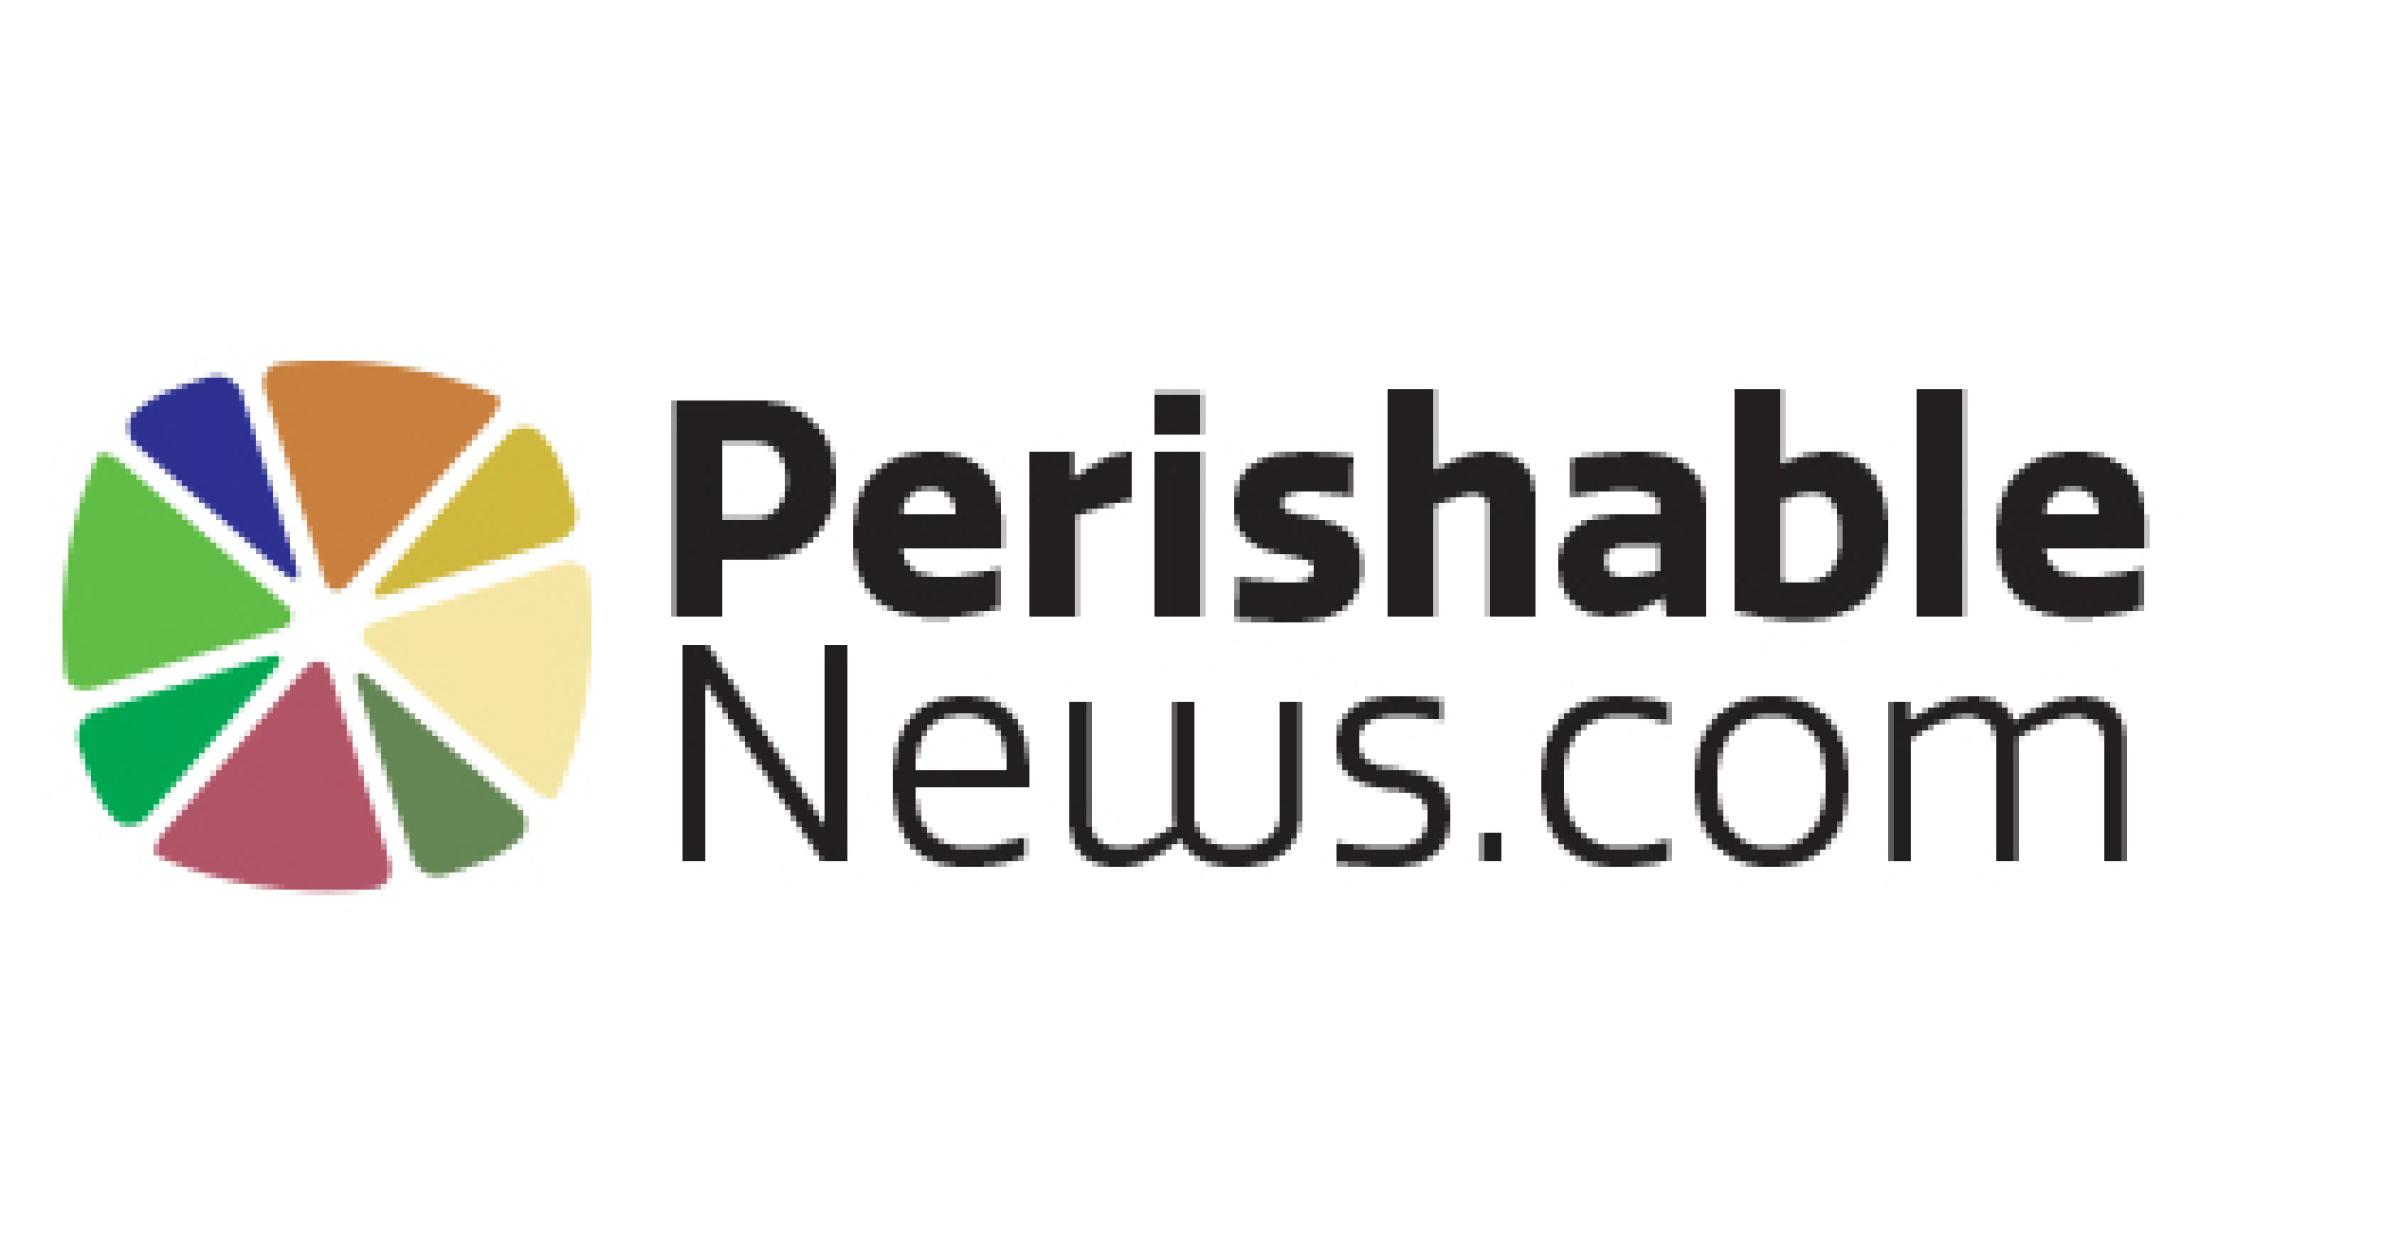 New Seasons Market Partners with Afresh, Bringing FresherProduceto Consumers